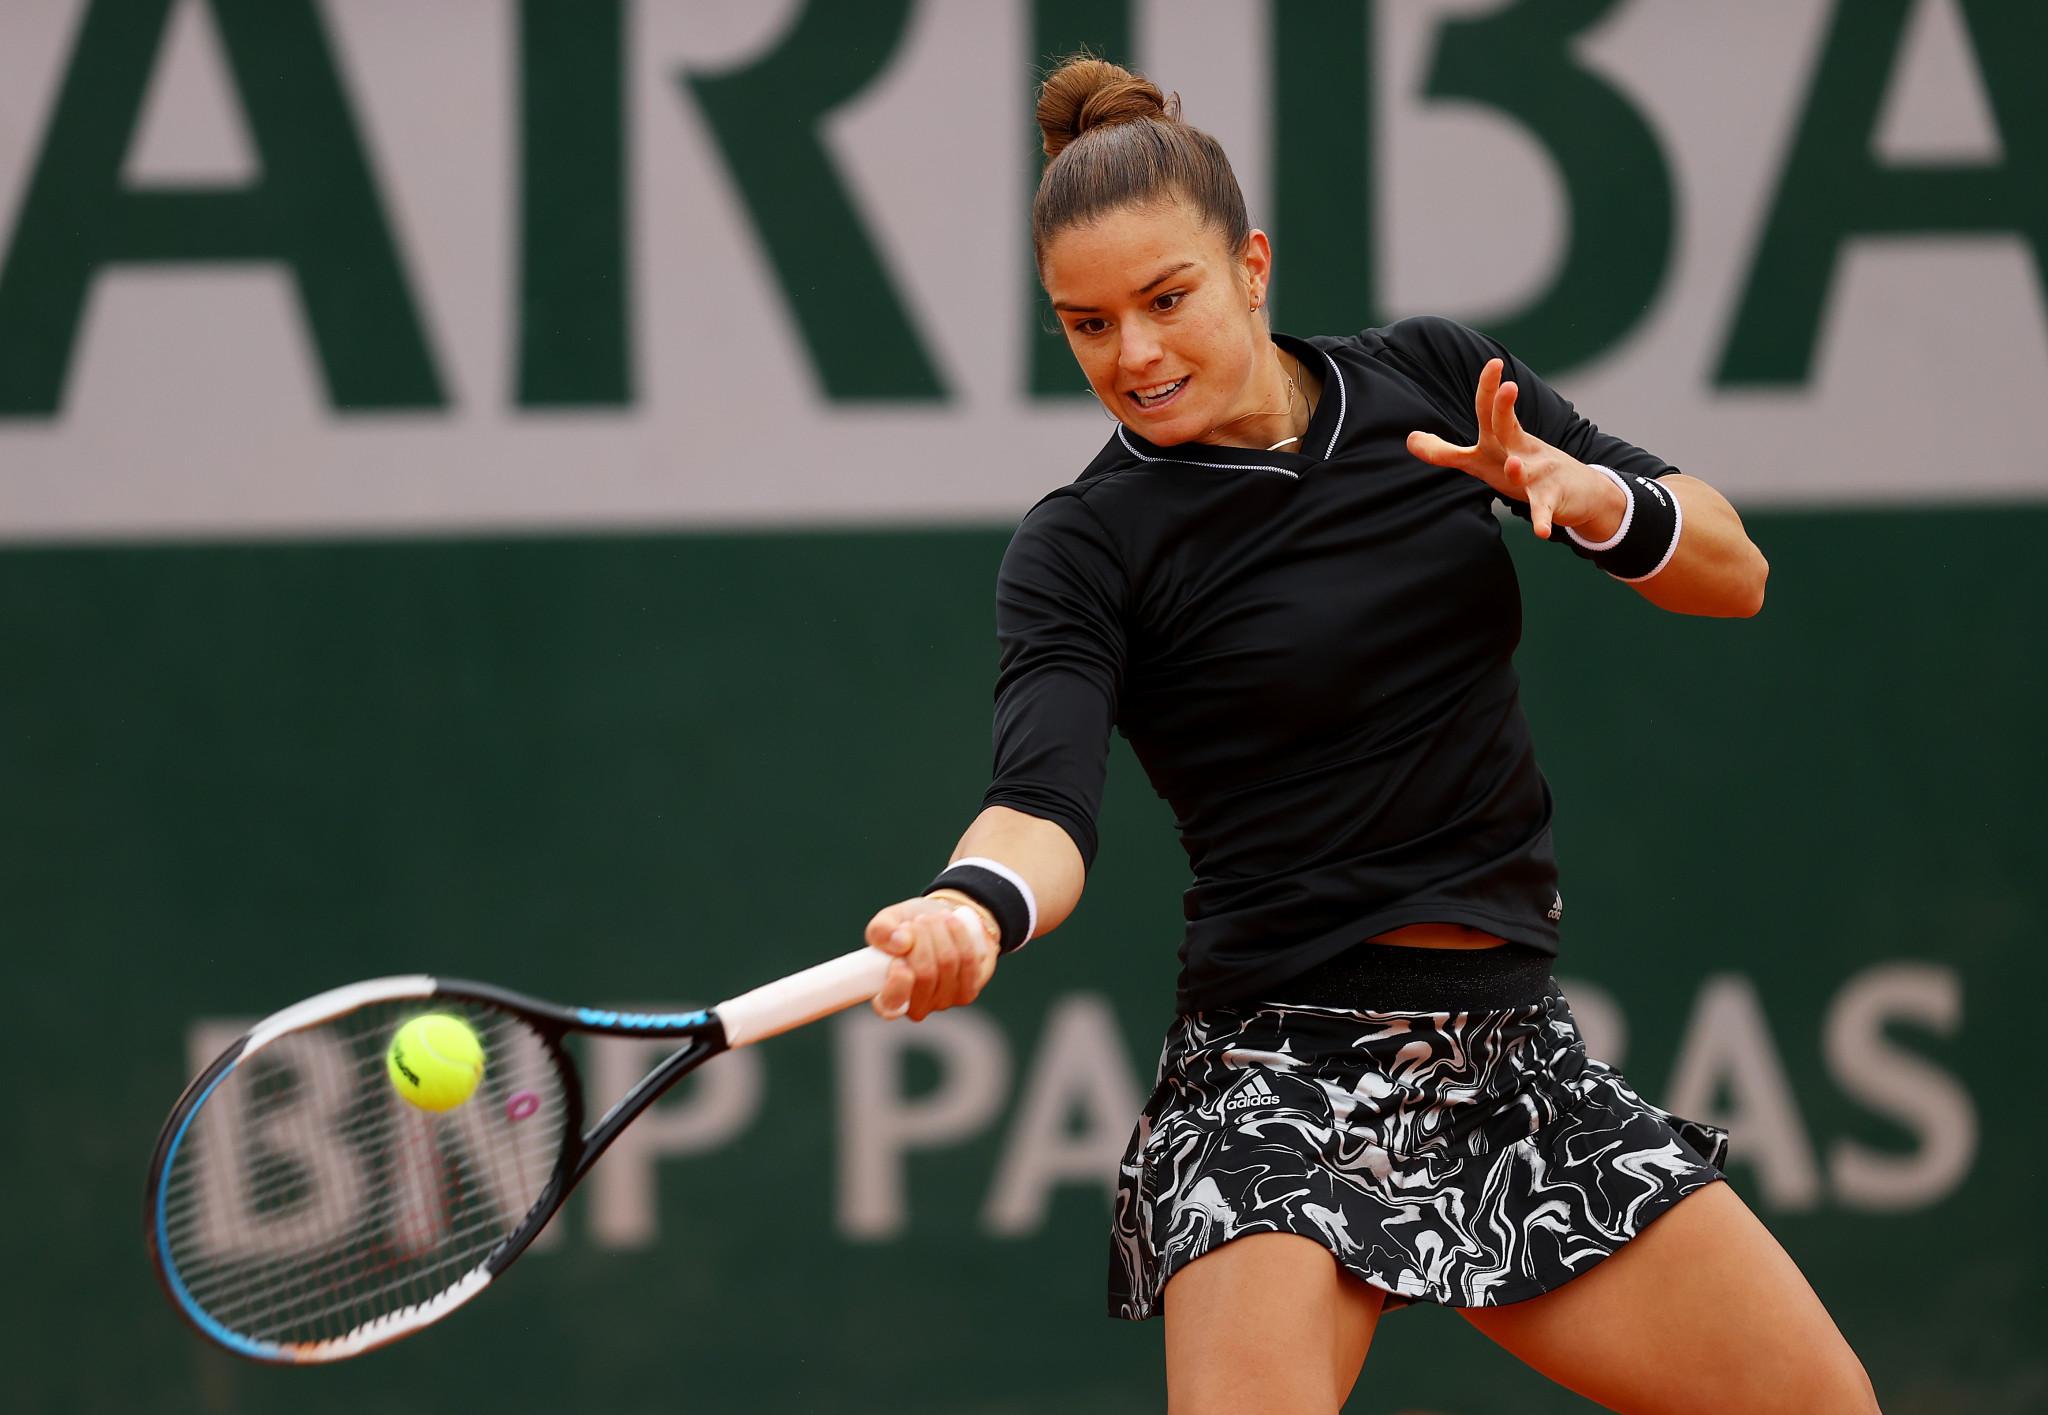 Greece's Maria Sakkari broke Ajla Tomljanović of Australia seven times in a straight-sets win ©Getty Images